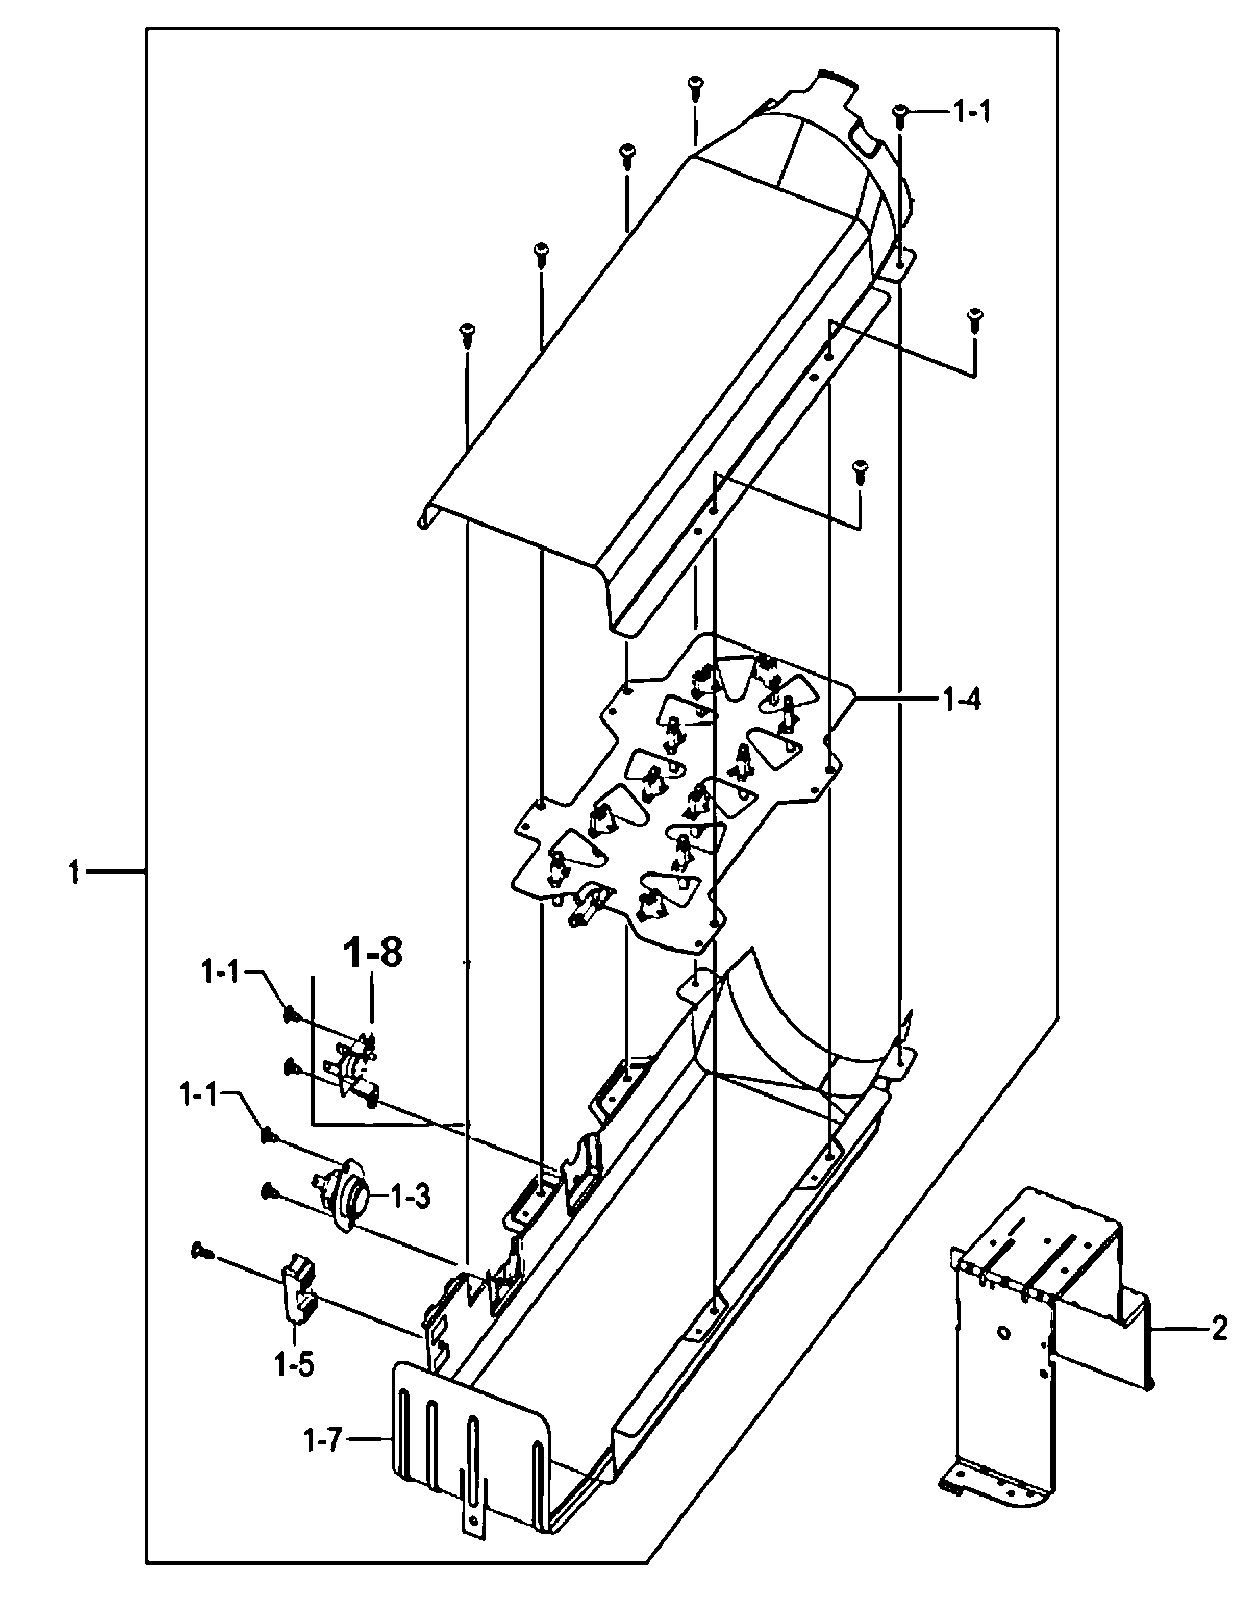 samsung dv520aep xaa dryer wiring diagram